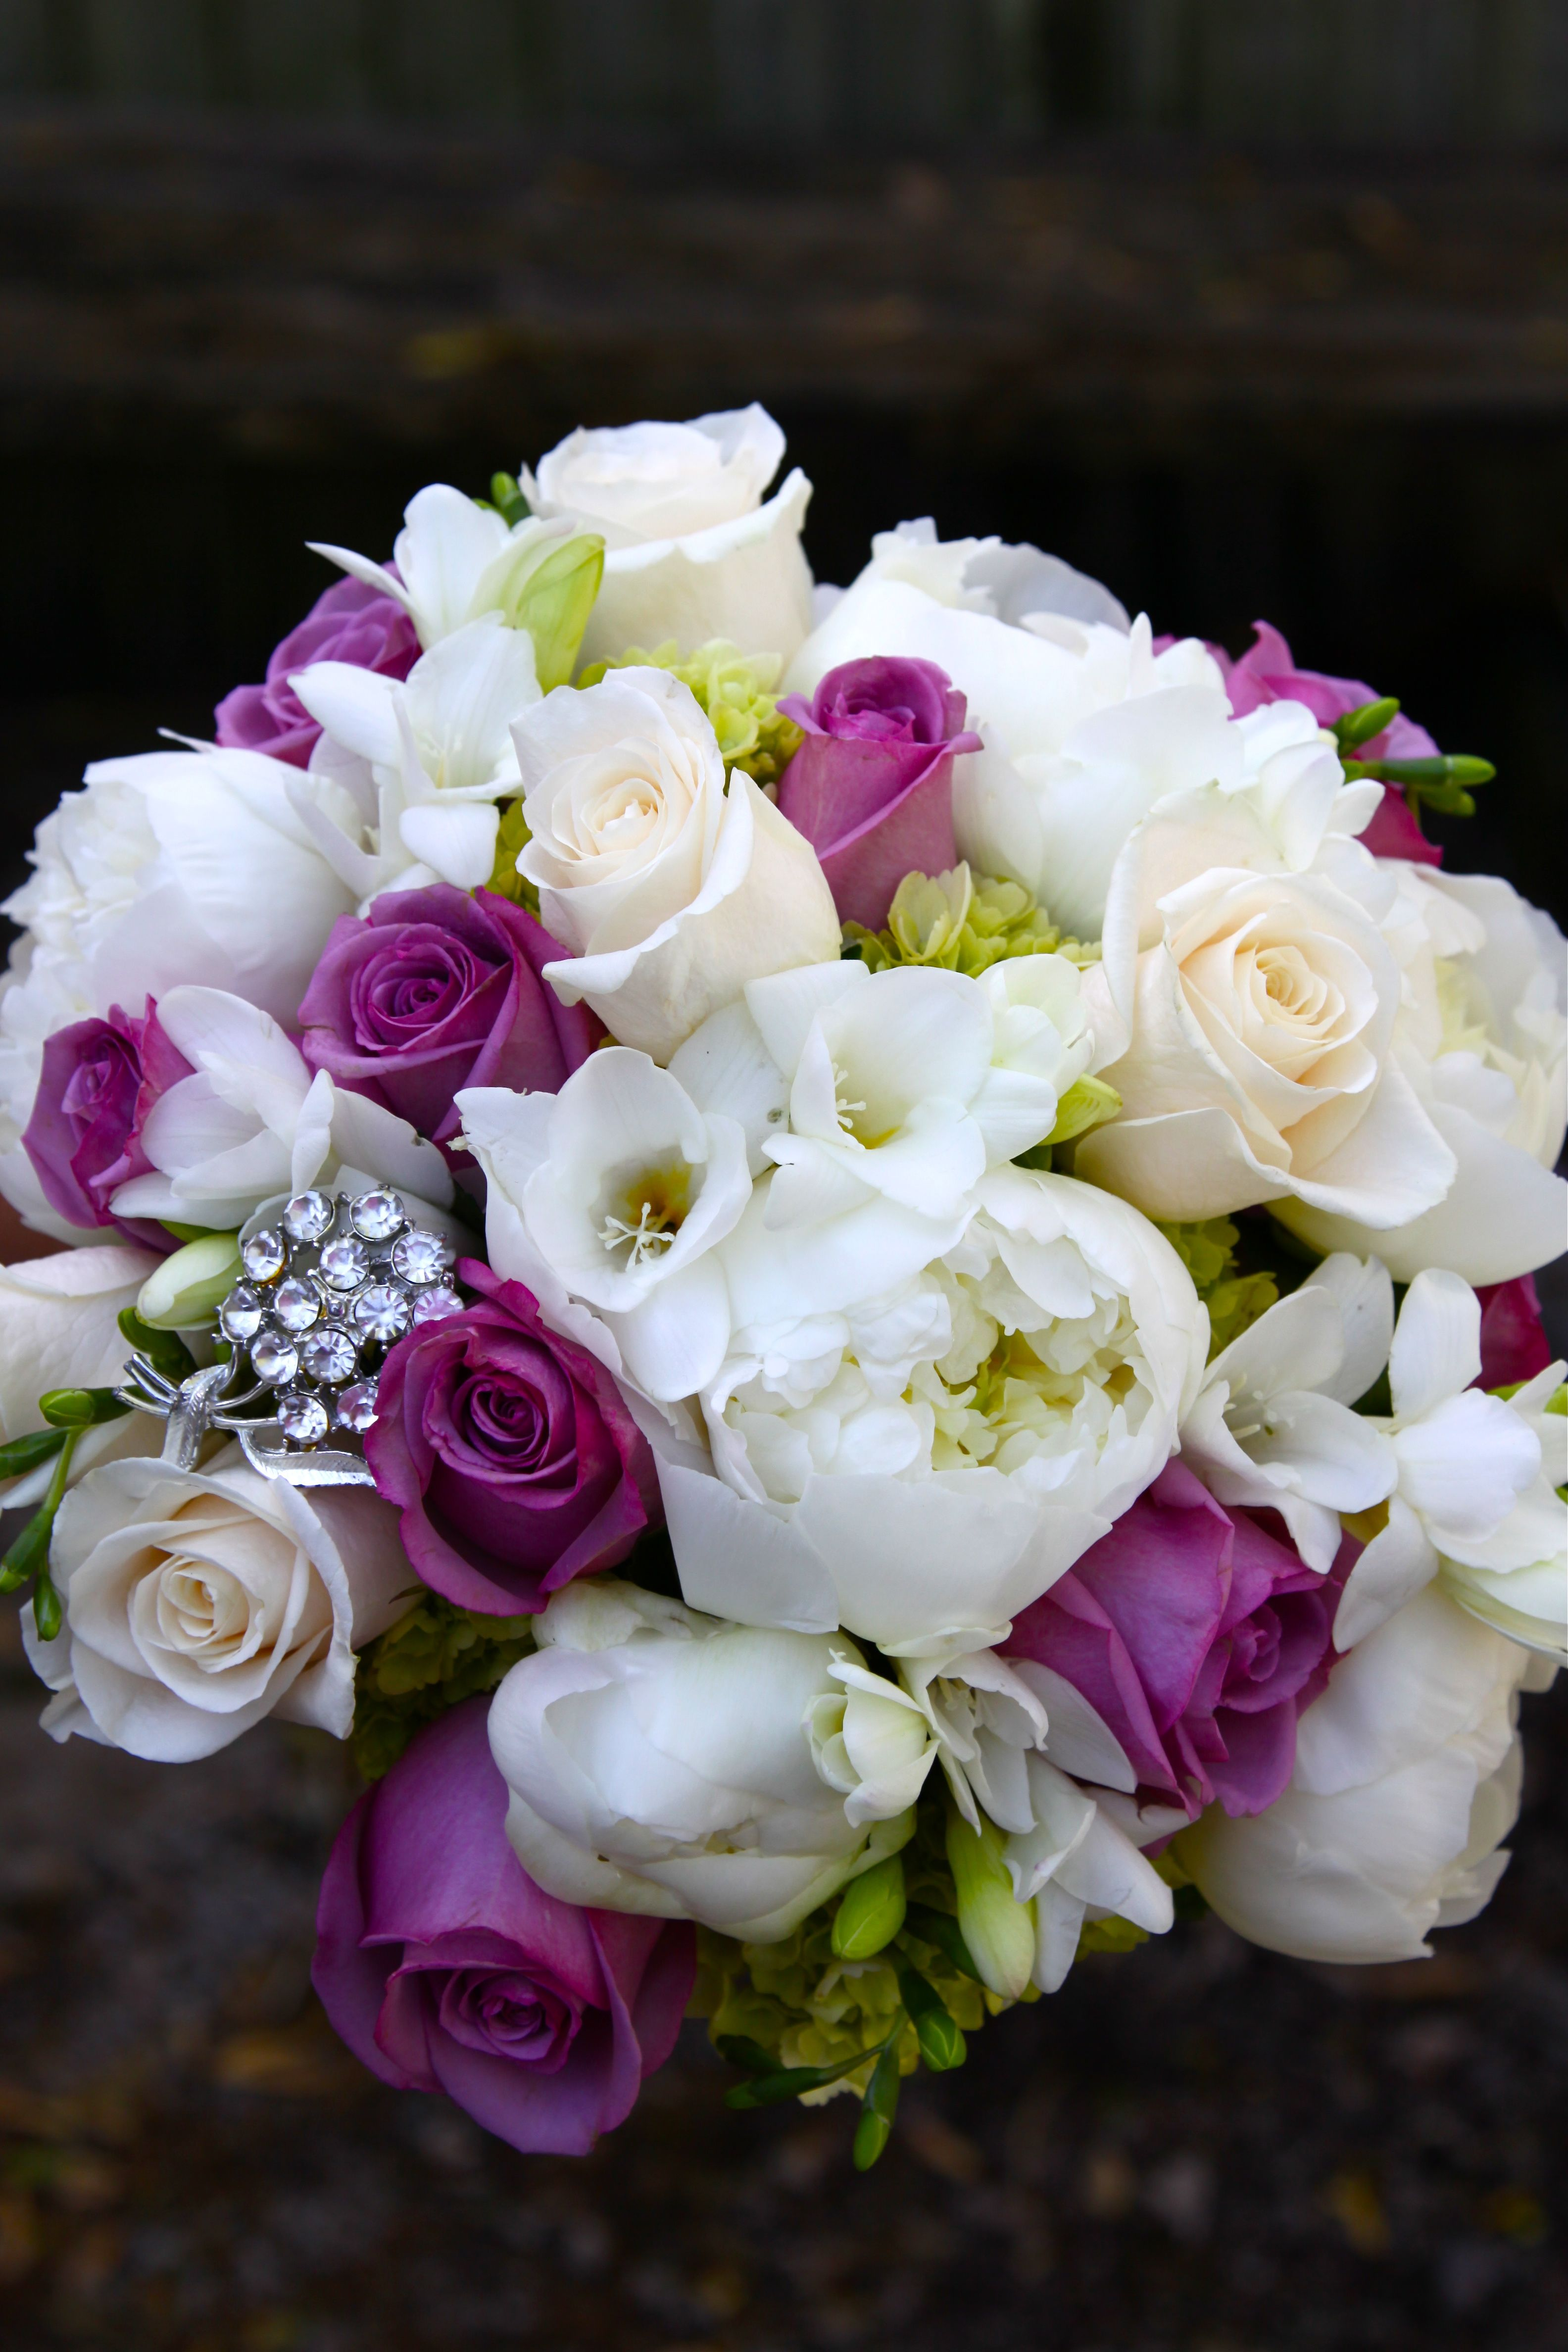 Wedding Boka With Keepsake Heirloom Brooch Kathy Miller At Spring